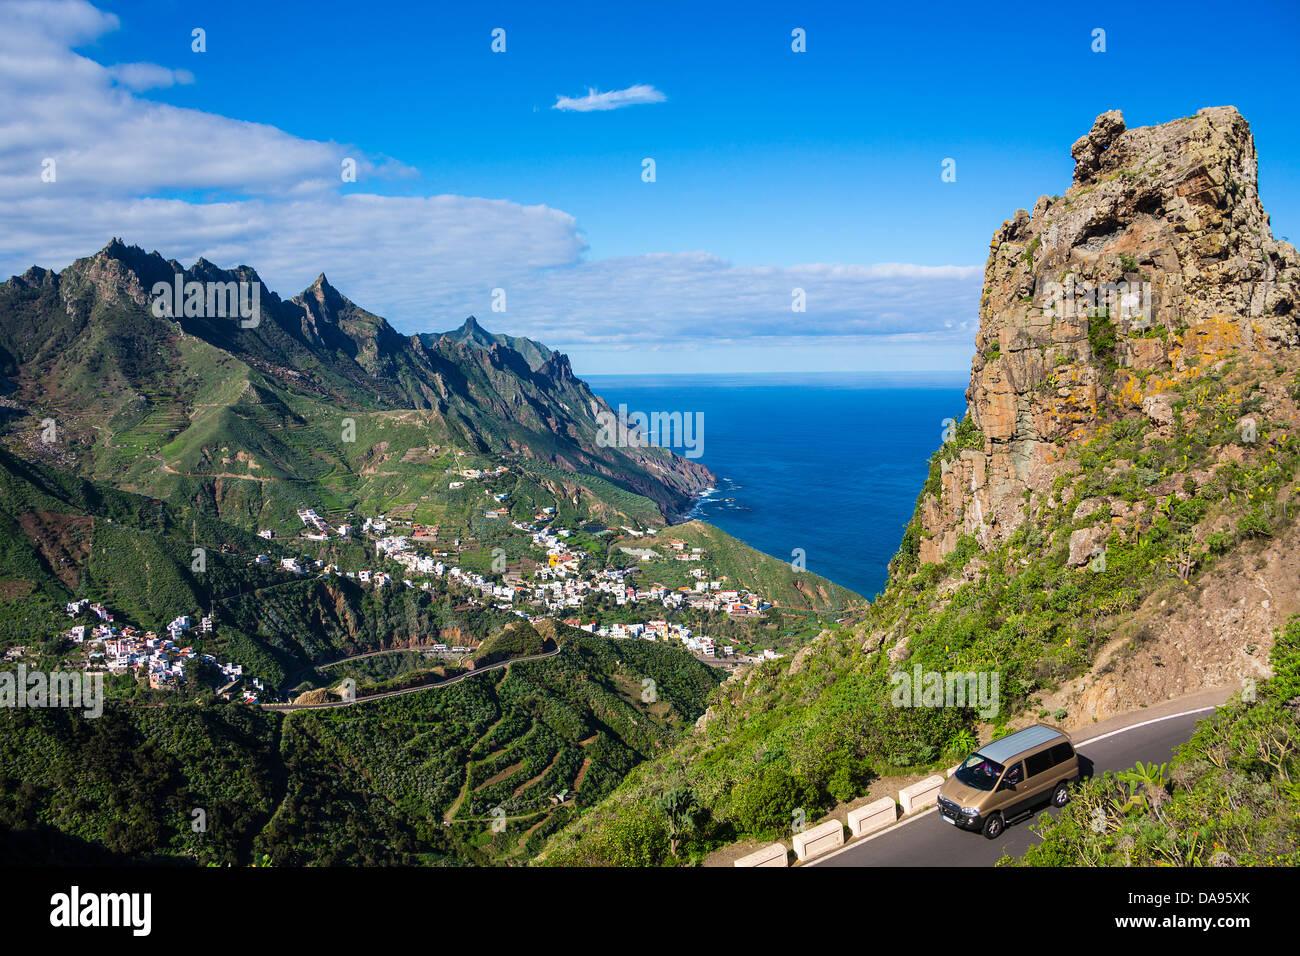 Spain, Europe, Canary Islands, Taganana, Tenerife Island, Tenerife, Teneriffa, Taganana, mountains, see, green - Stock Image